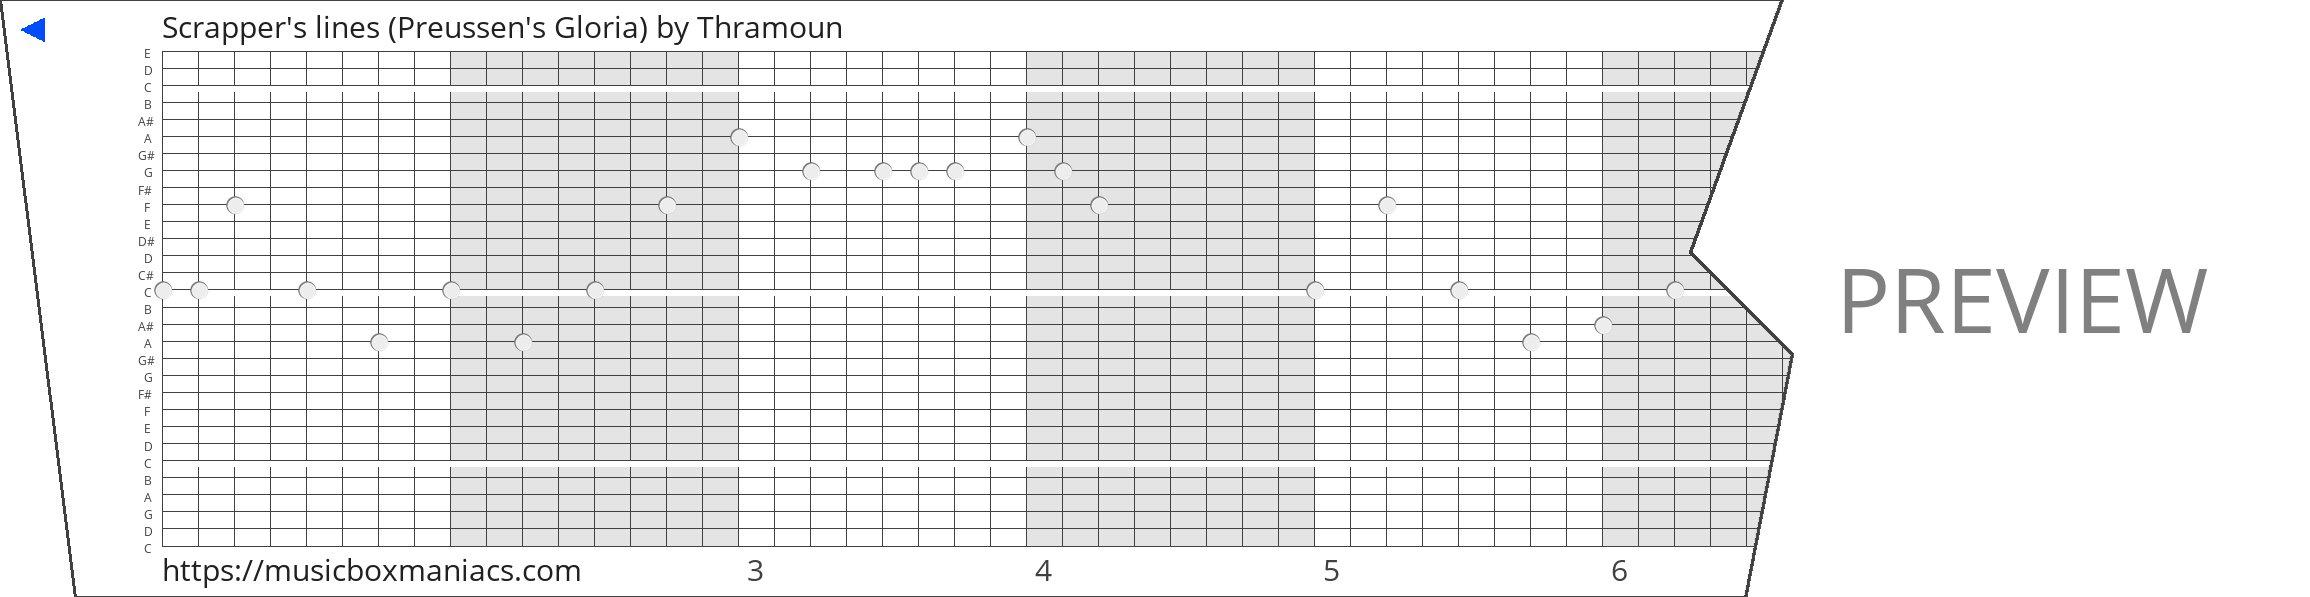 Scrapper's lines (Preussen's Gloria) 30 note music box paper strip